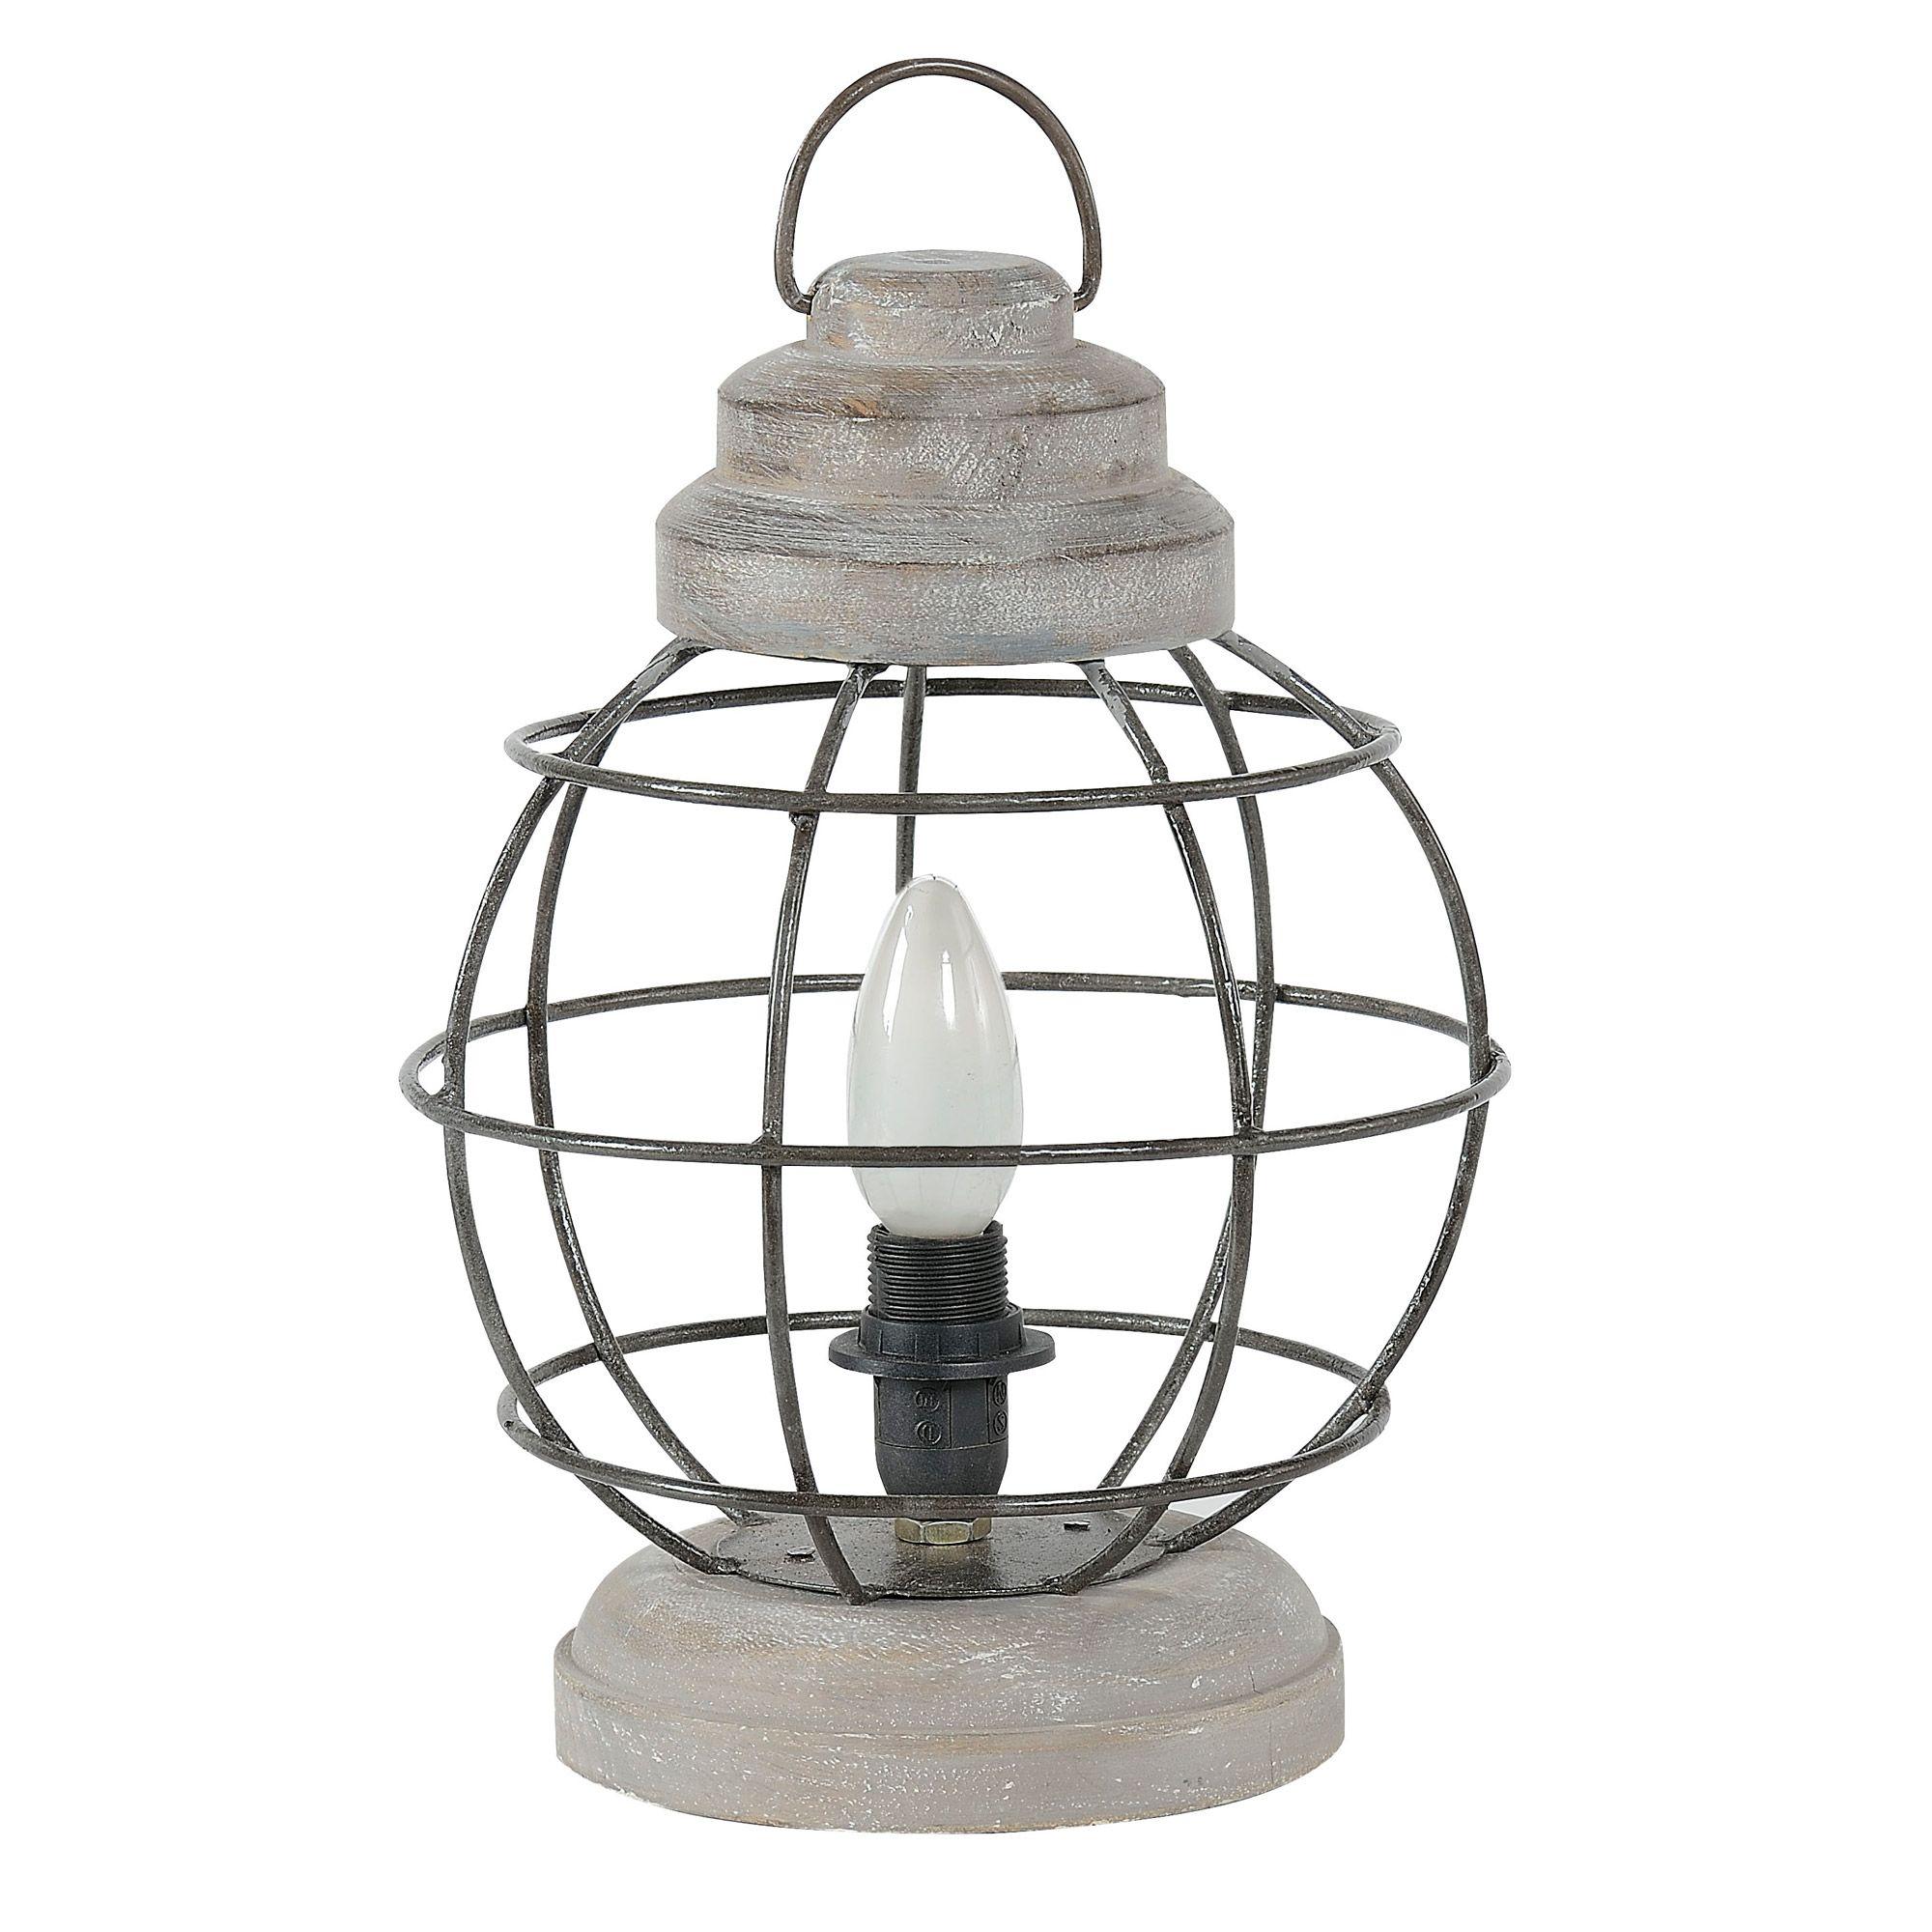 Lampe A Poser En Metal Et Manguier Gris Werk Jardin D Ulysse Lampe Manguier Lampe A Poser